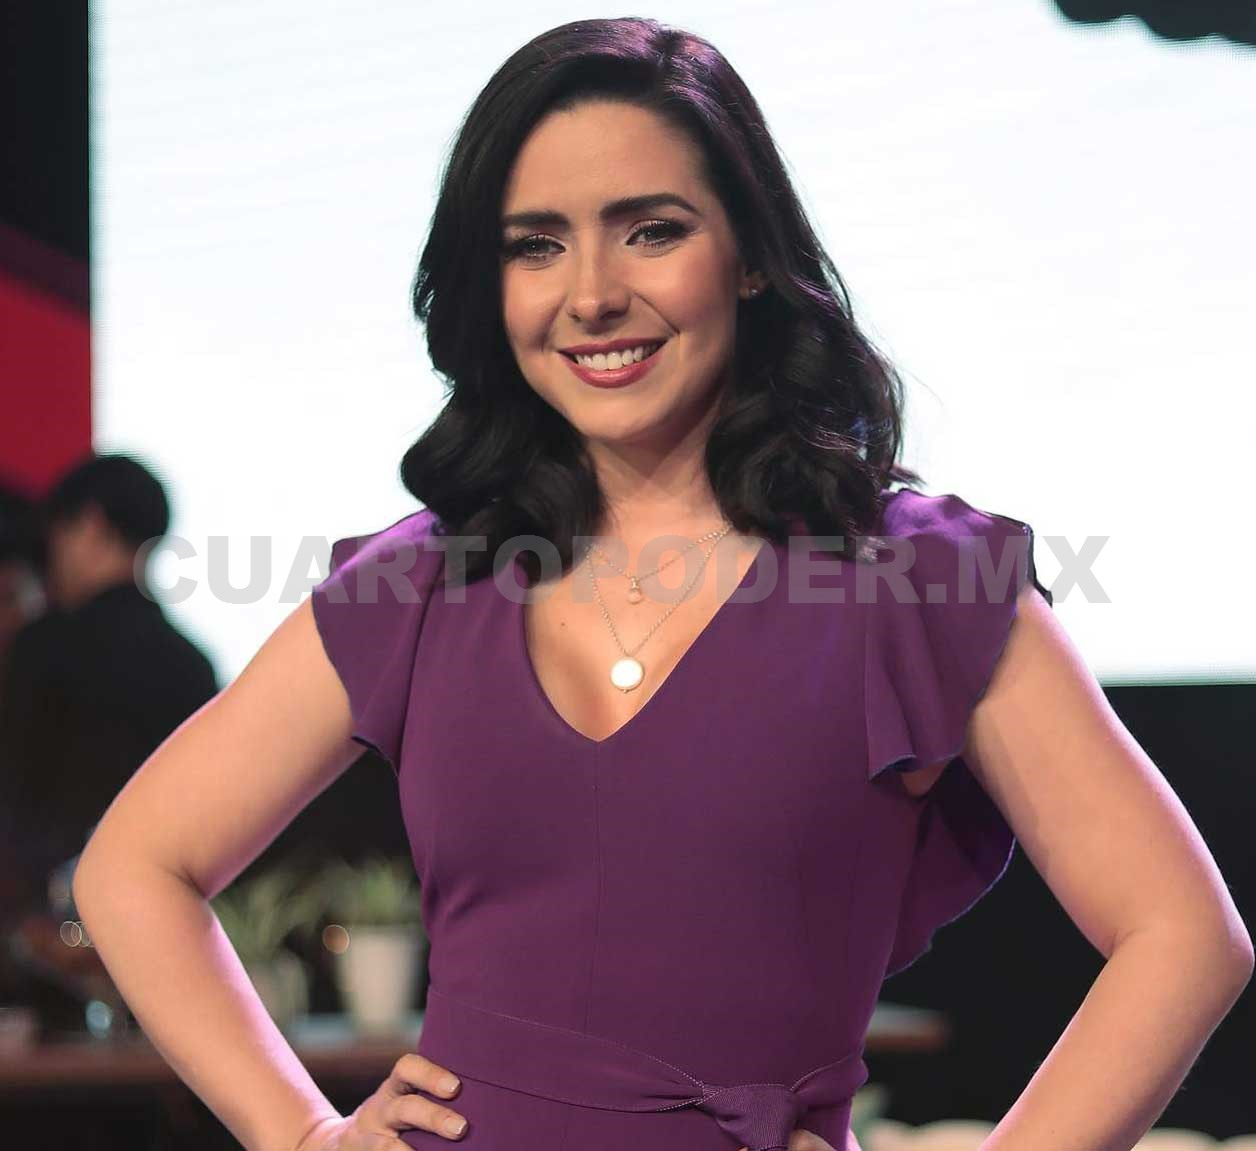 Ariadne Diaz Pics ariadne d�az dice s� al matrimonio